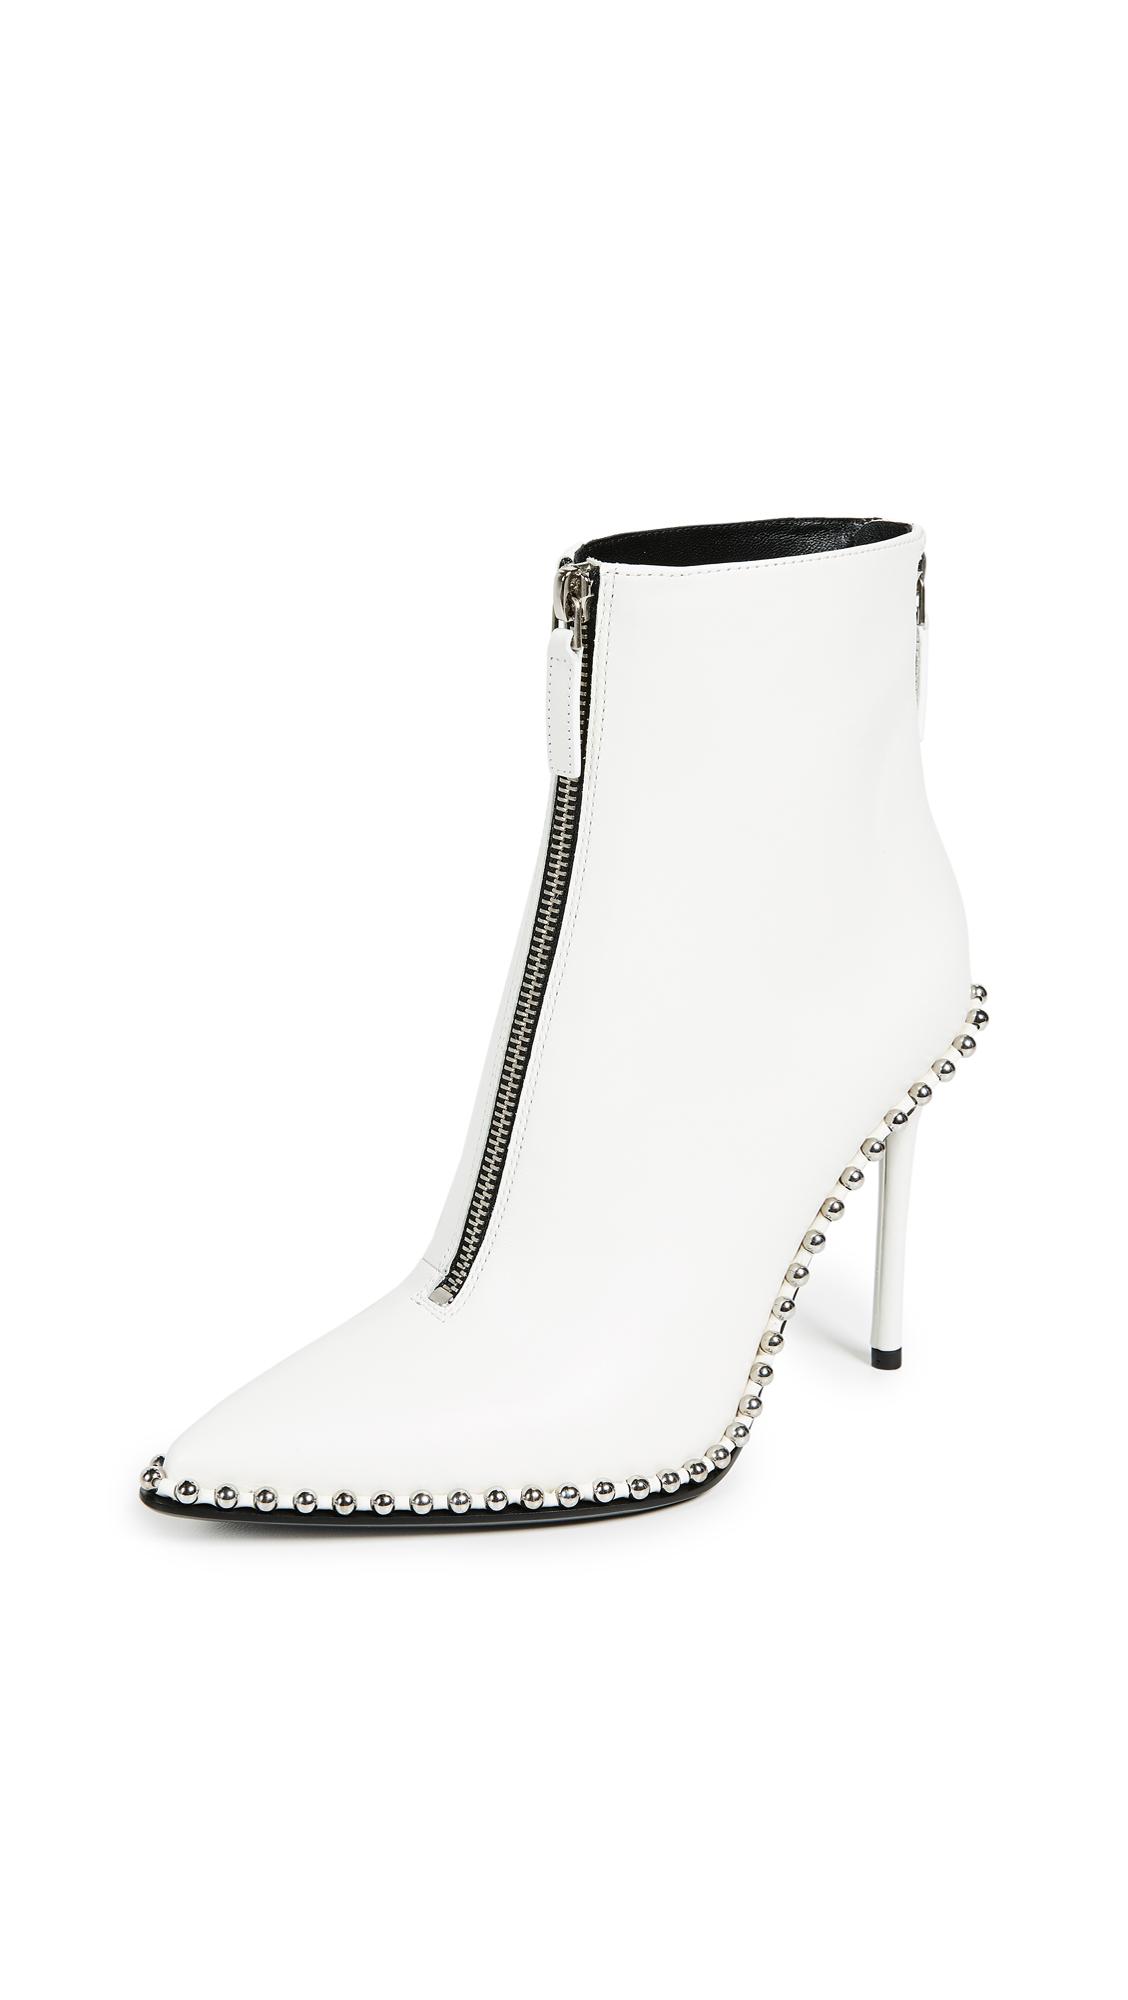 Alexander Wang Eri Boots - White